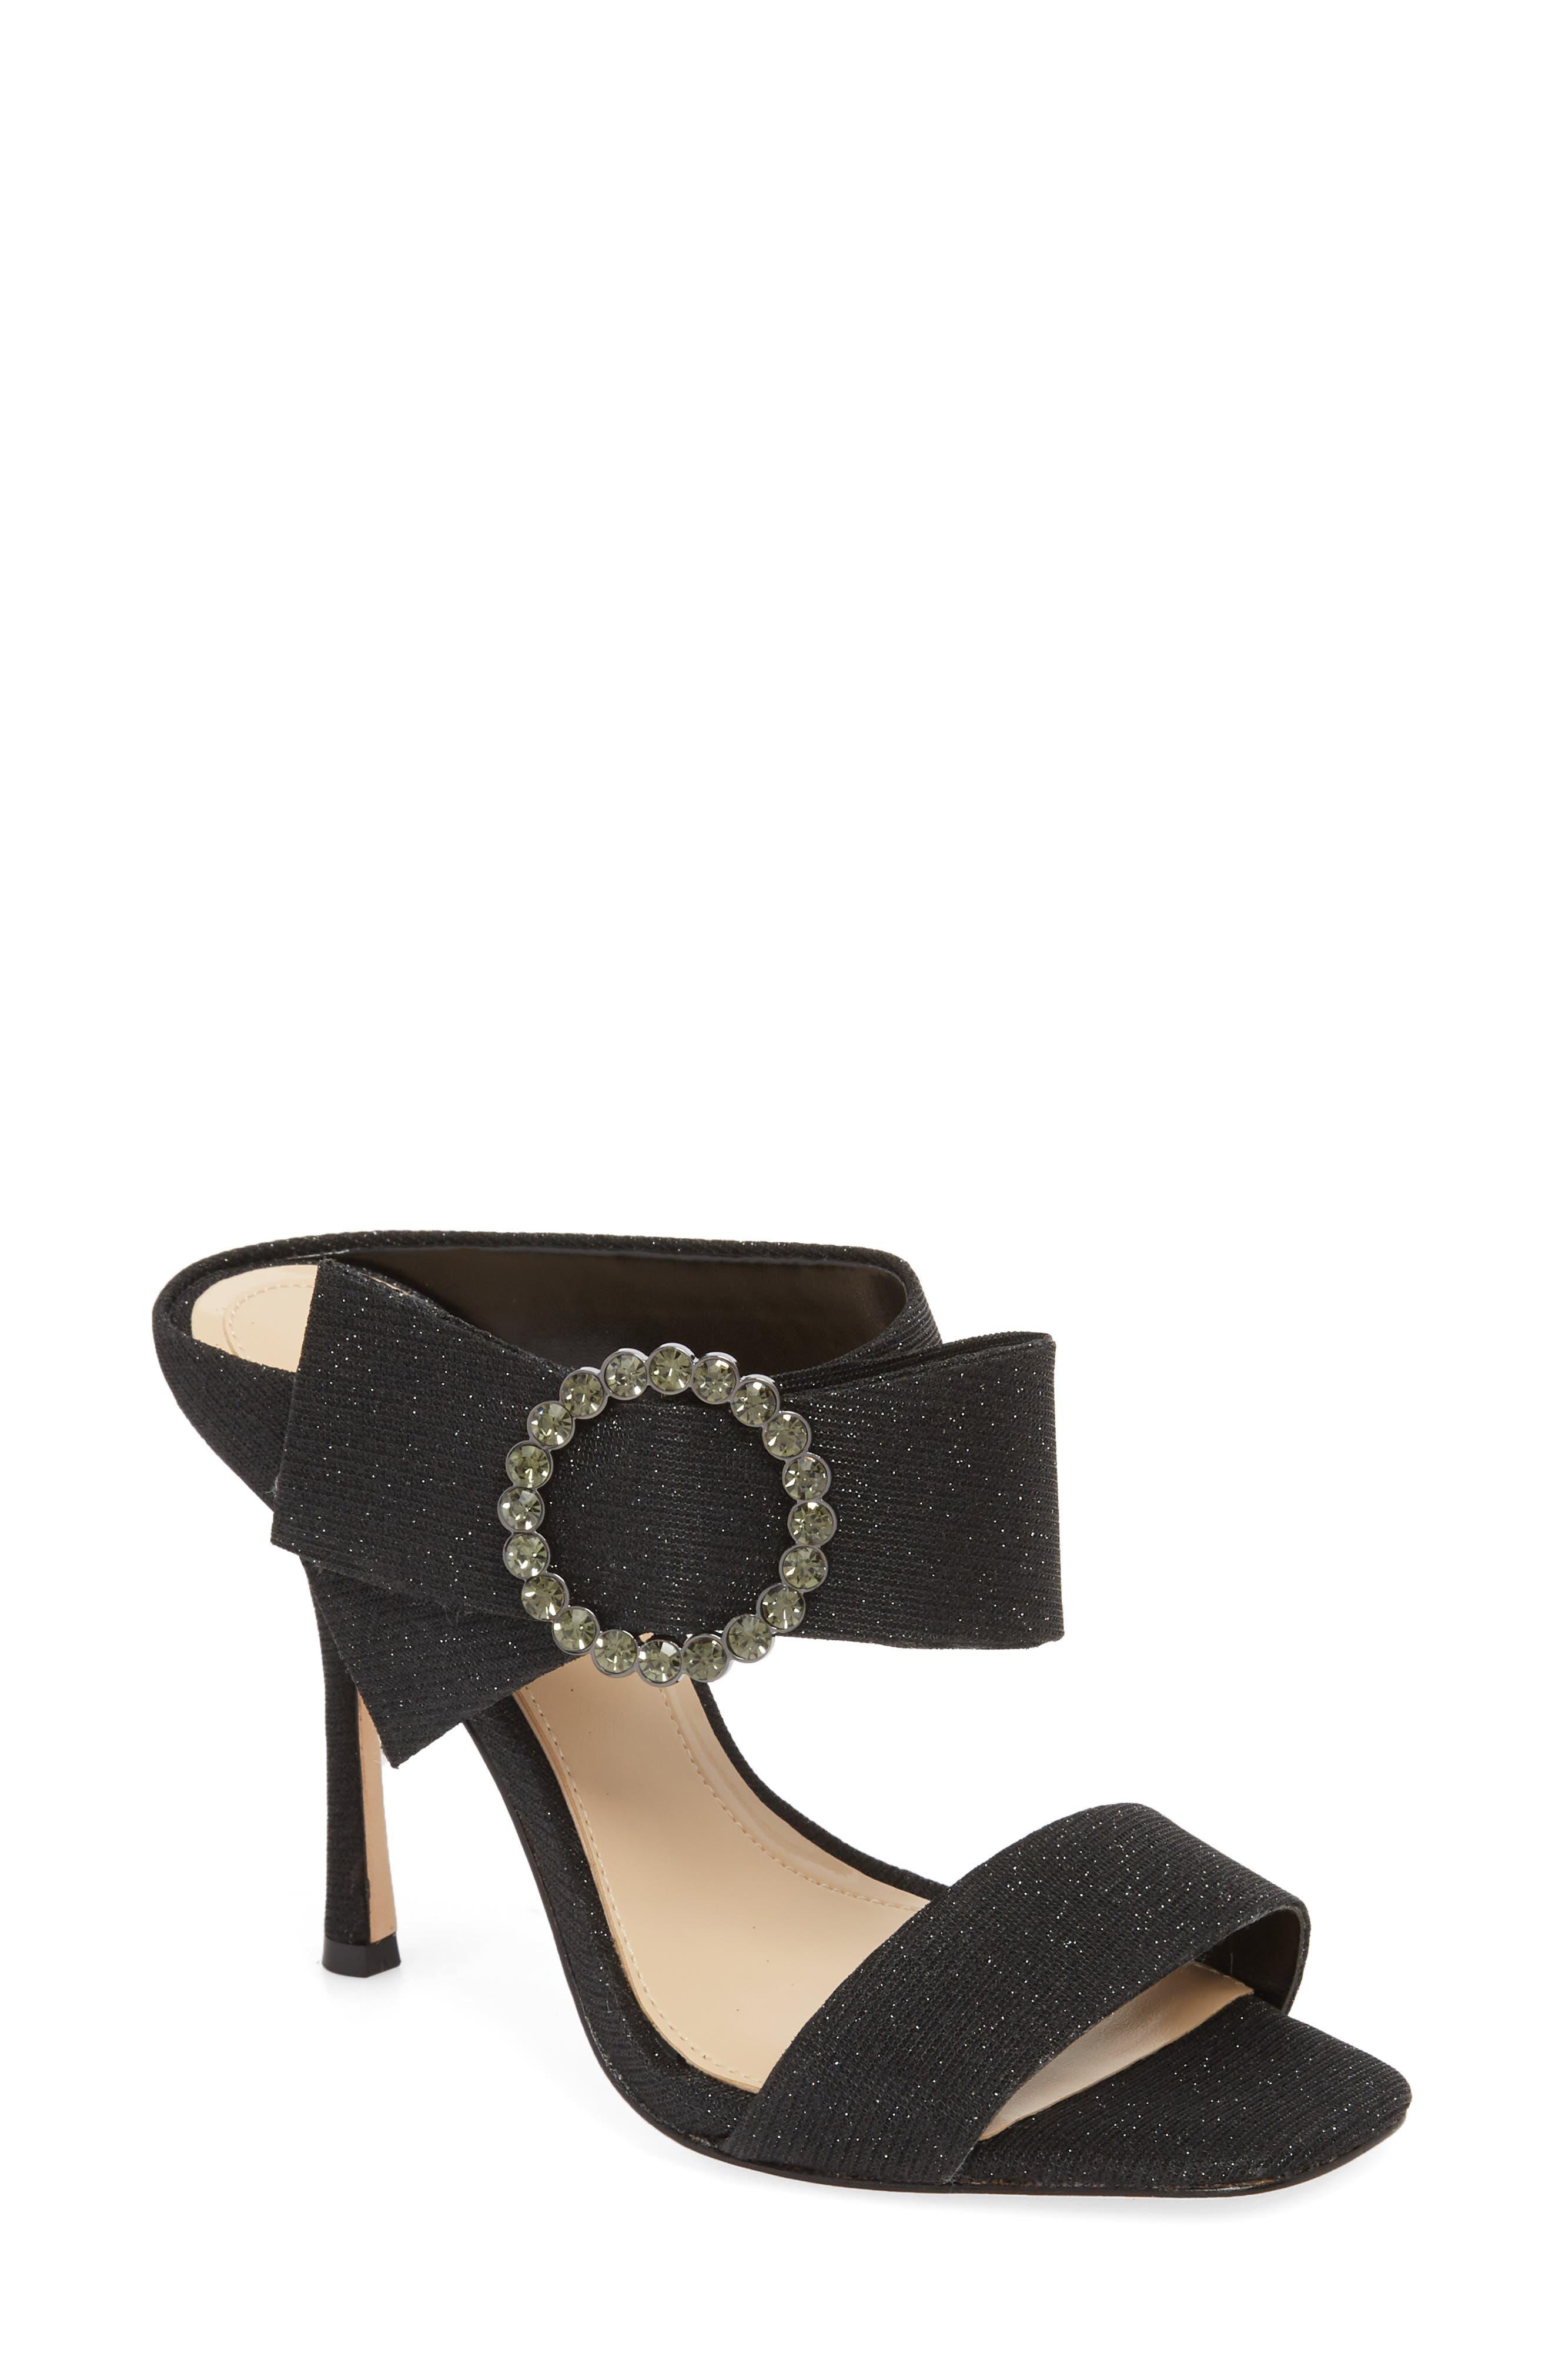 Westcott Sandal,                         Main,                         color, BLACK FABRIC